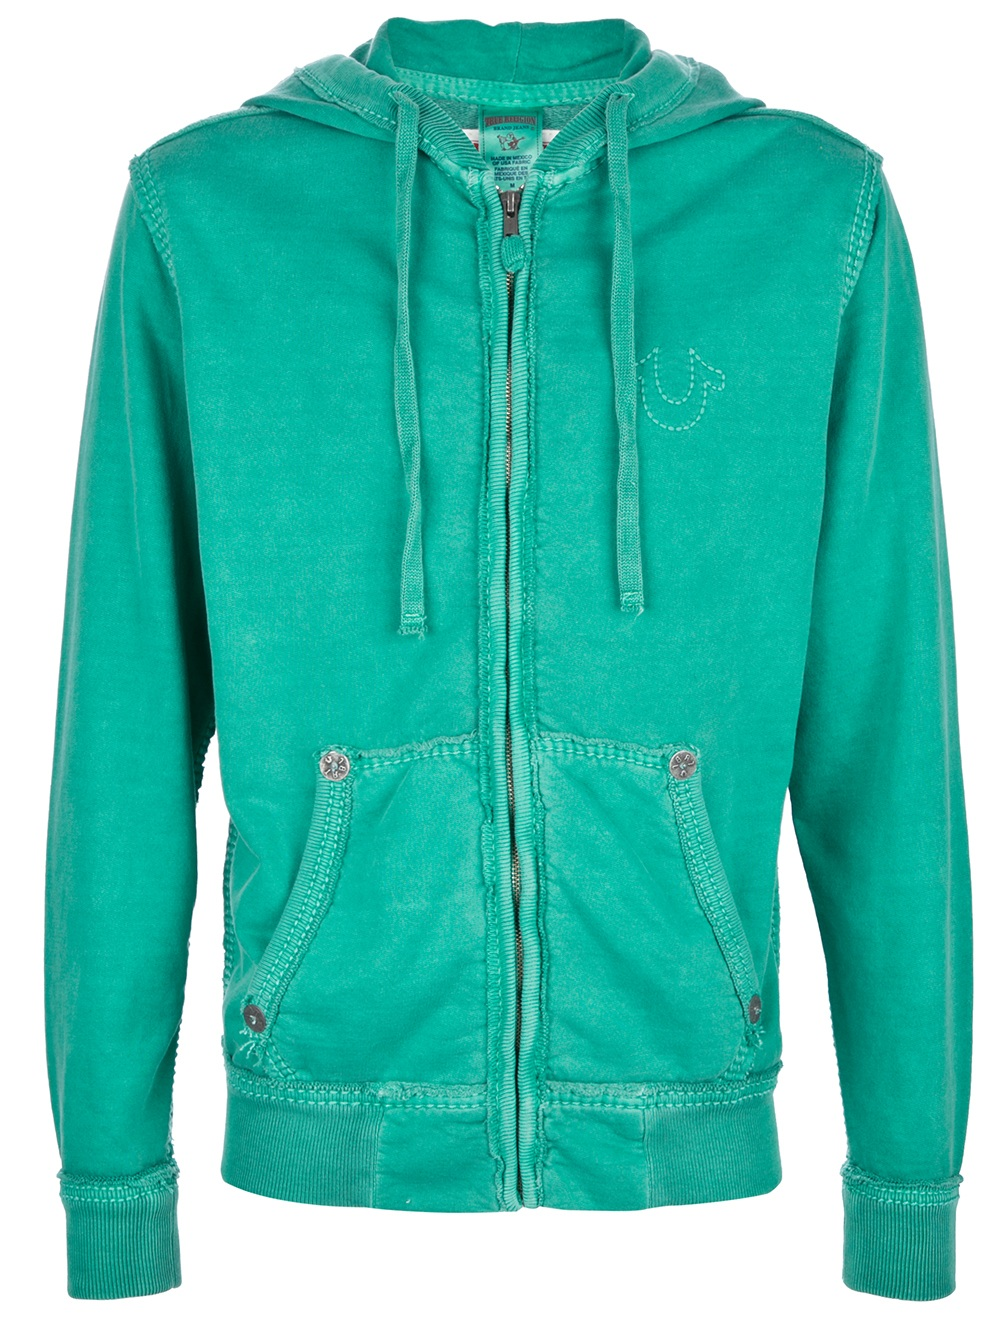 True religion hoodie men